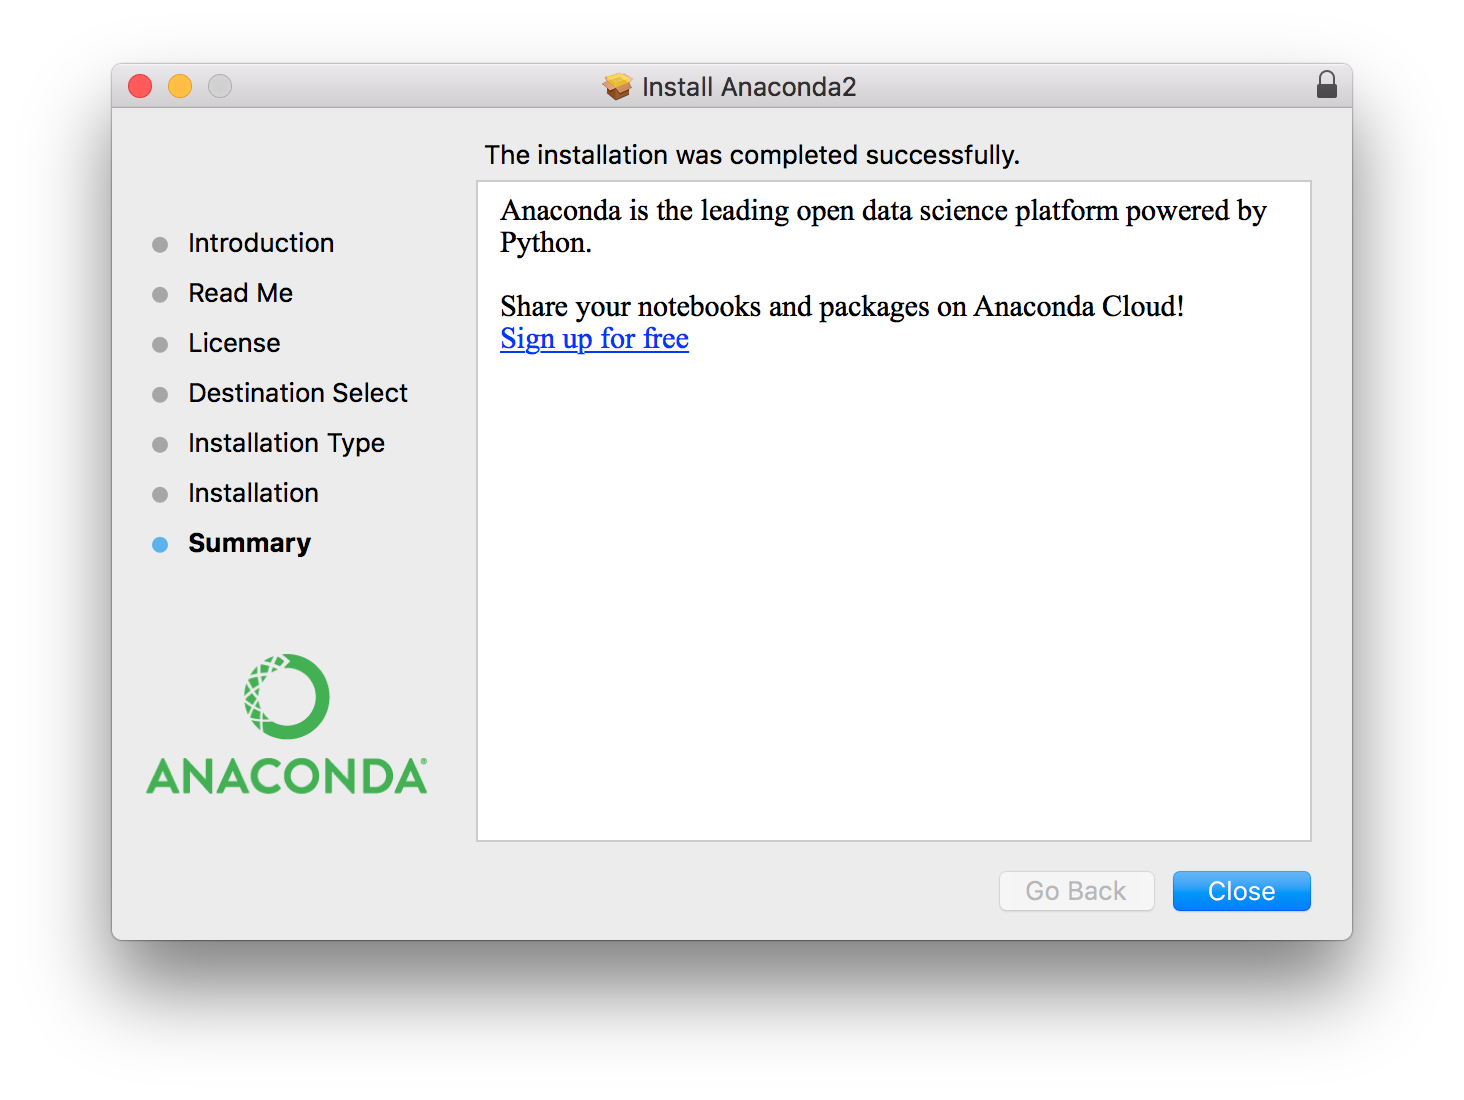 Anaconda2 Successful Install